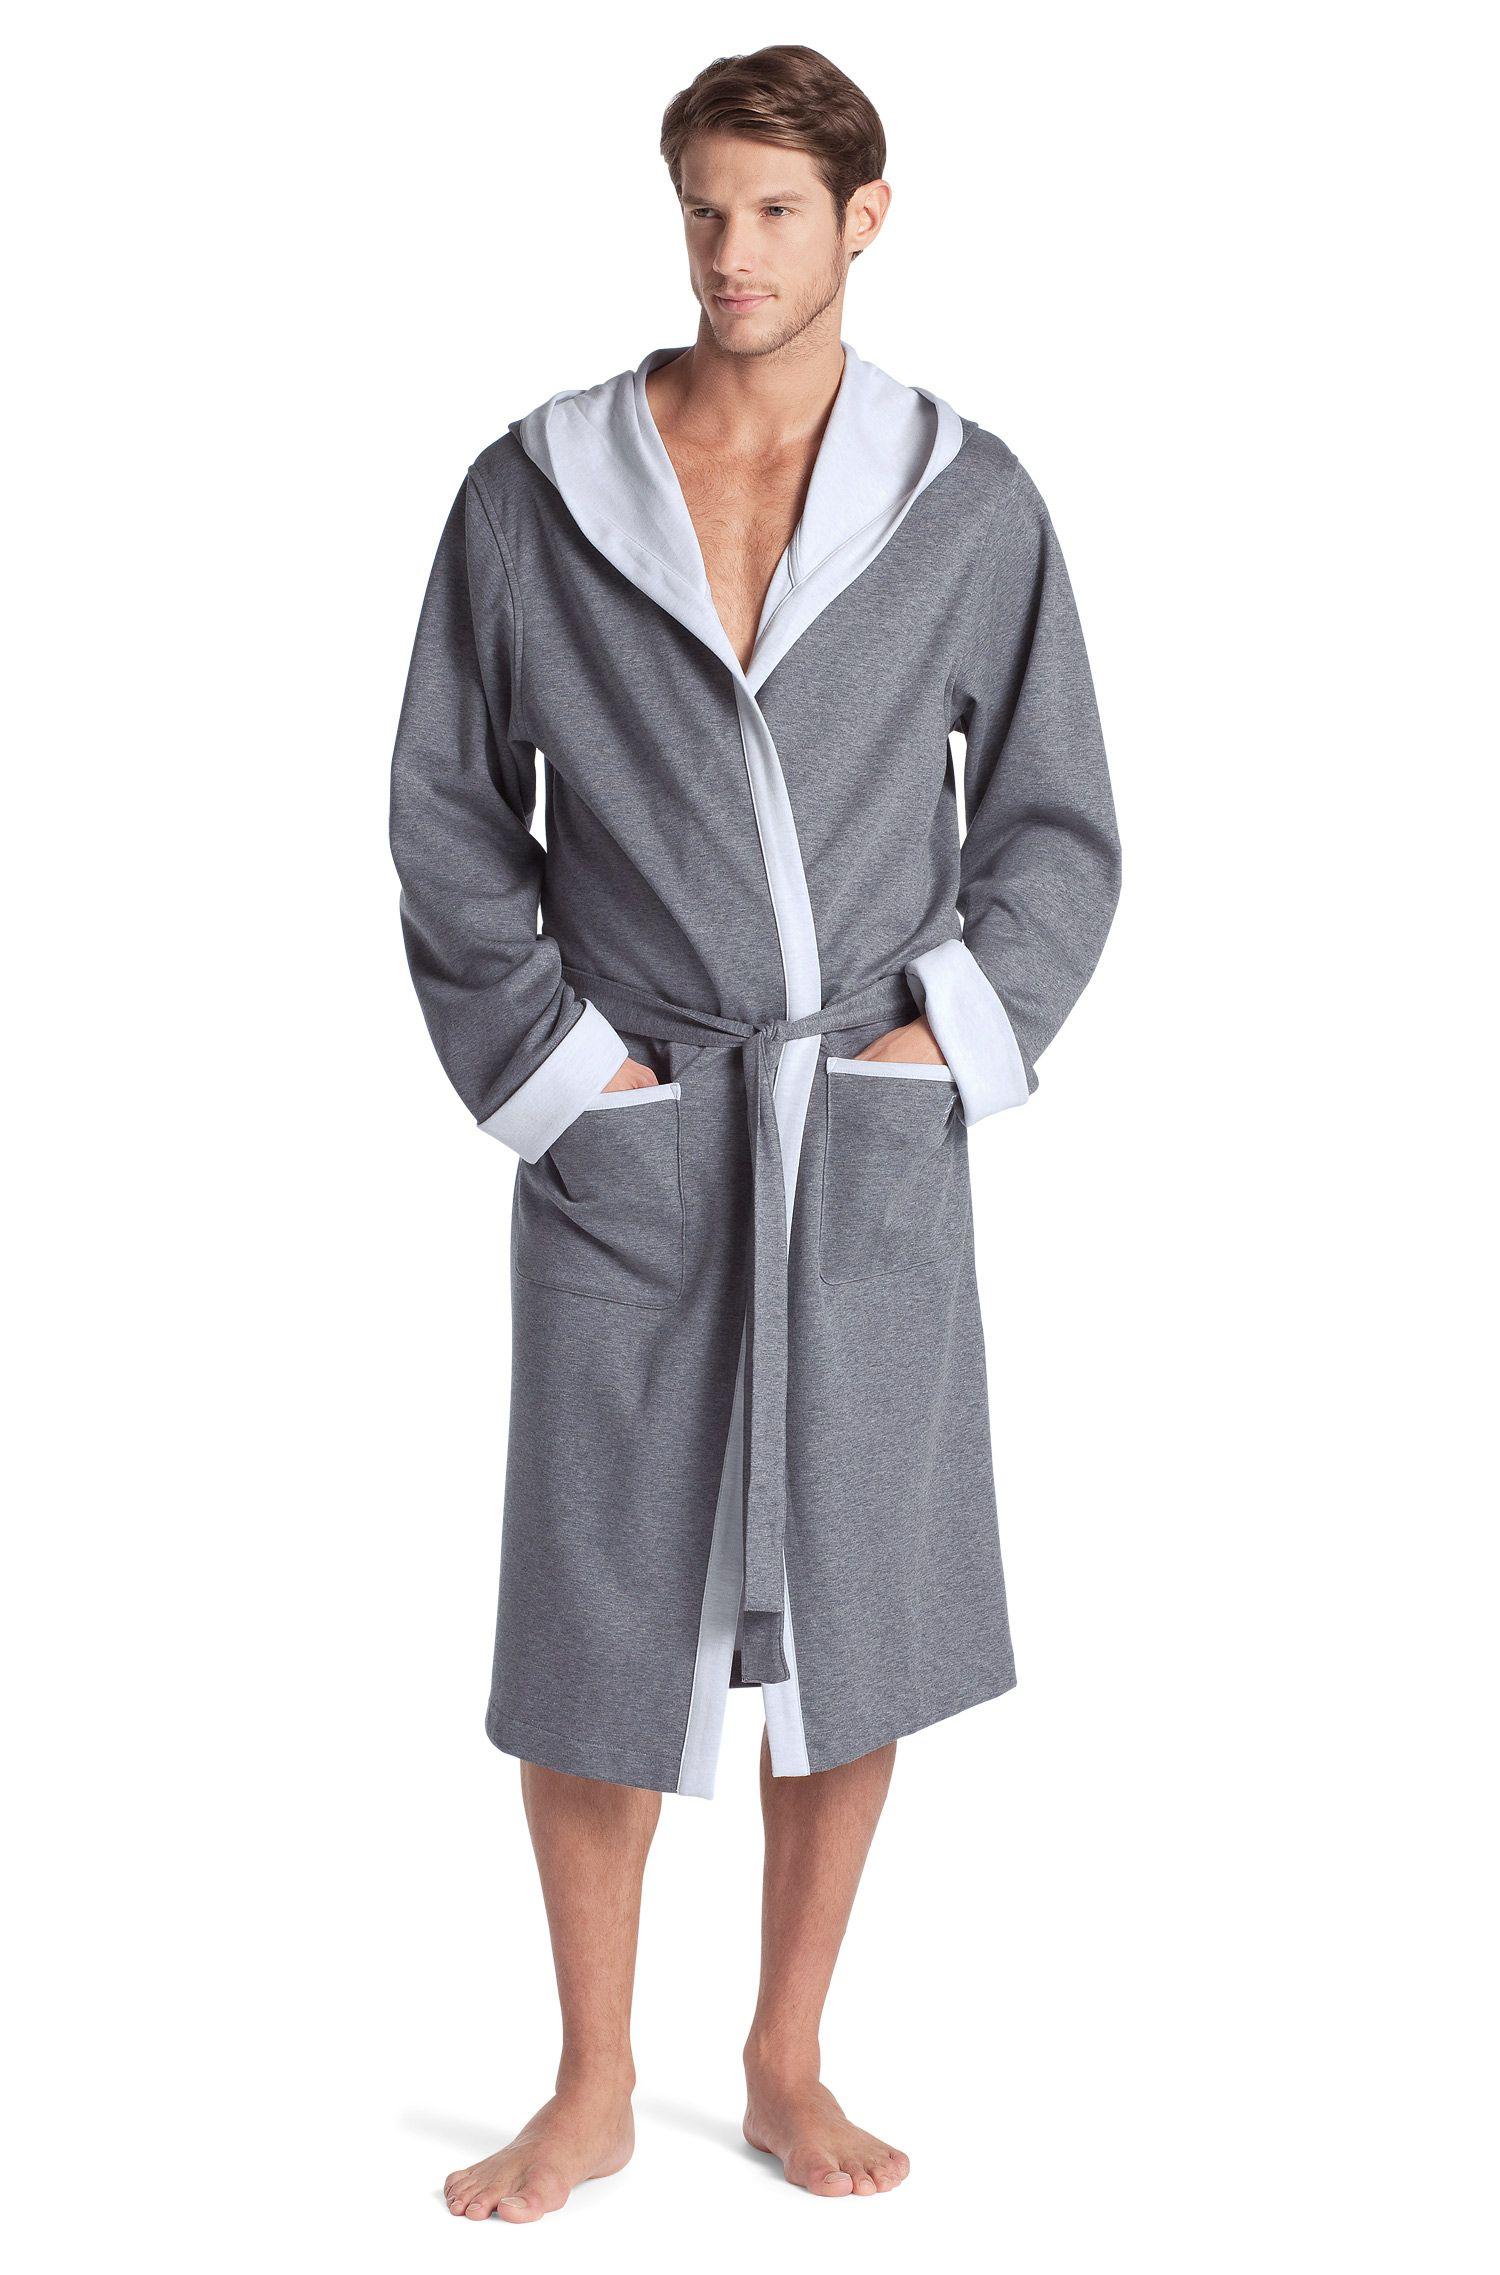 Ochtendjas ´Hooded Robe BM` met capuchon